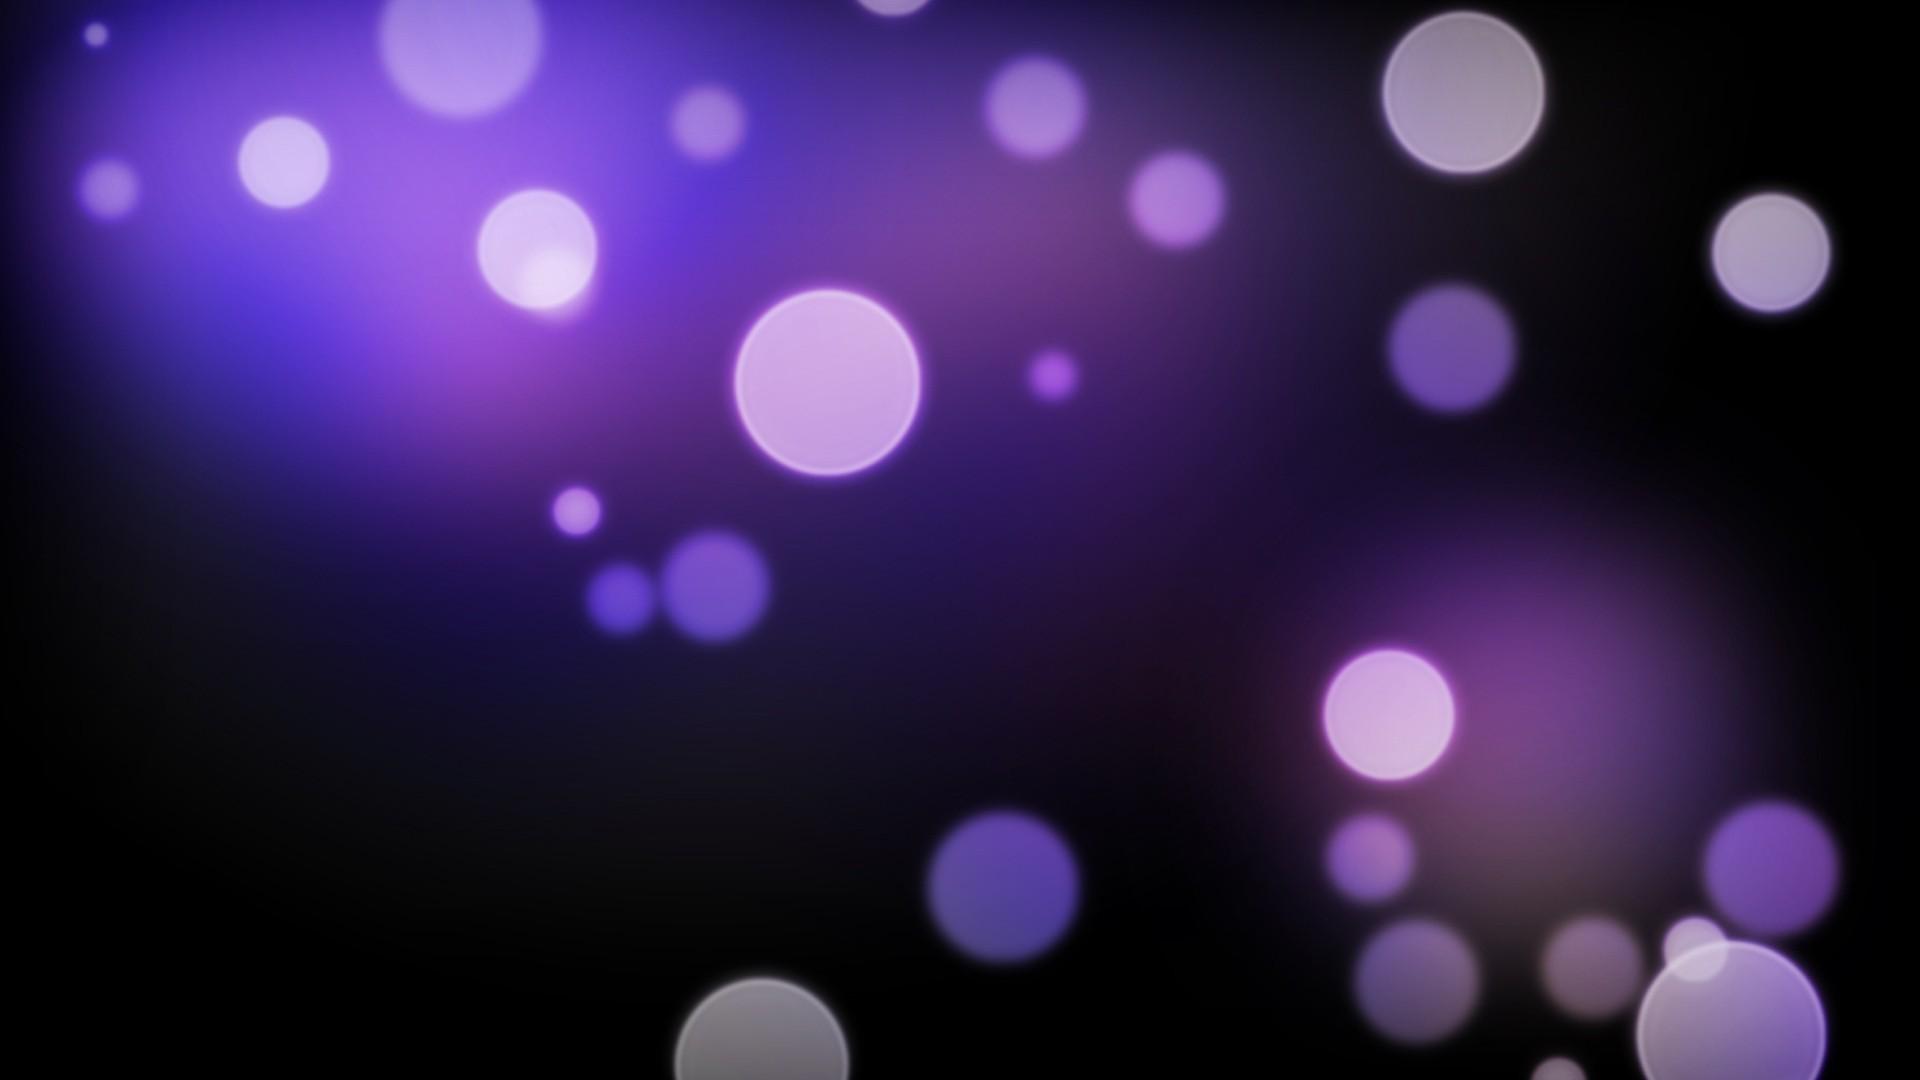 Simple Dark Purple Background